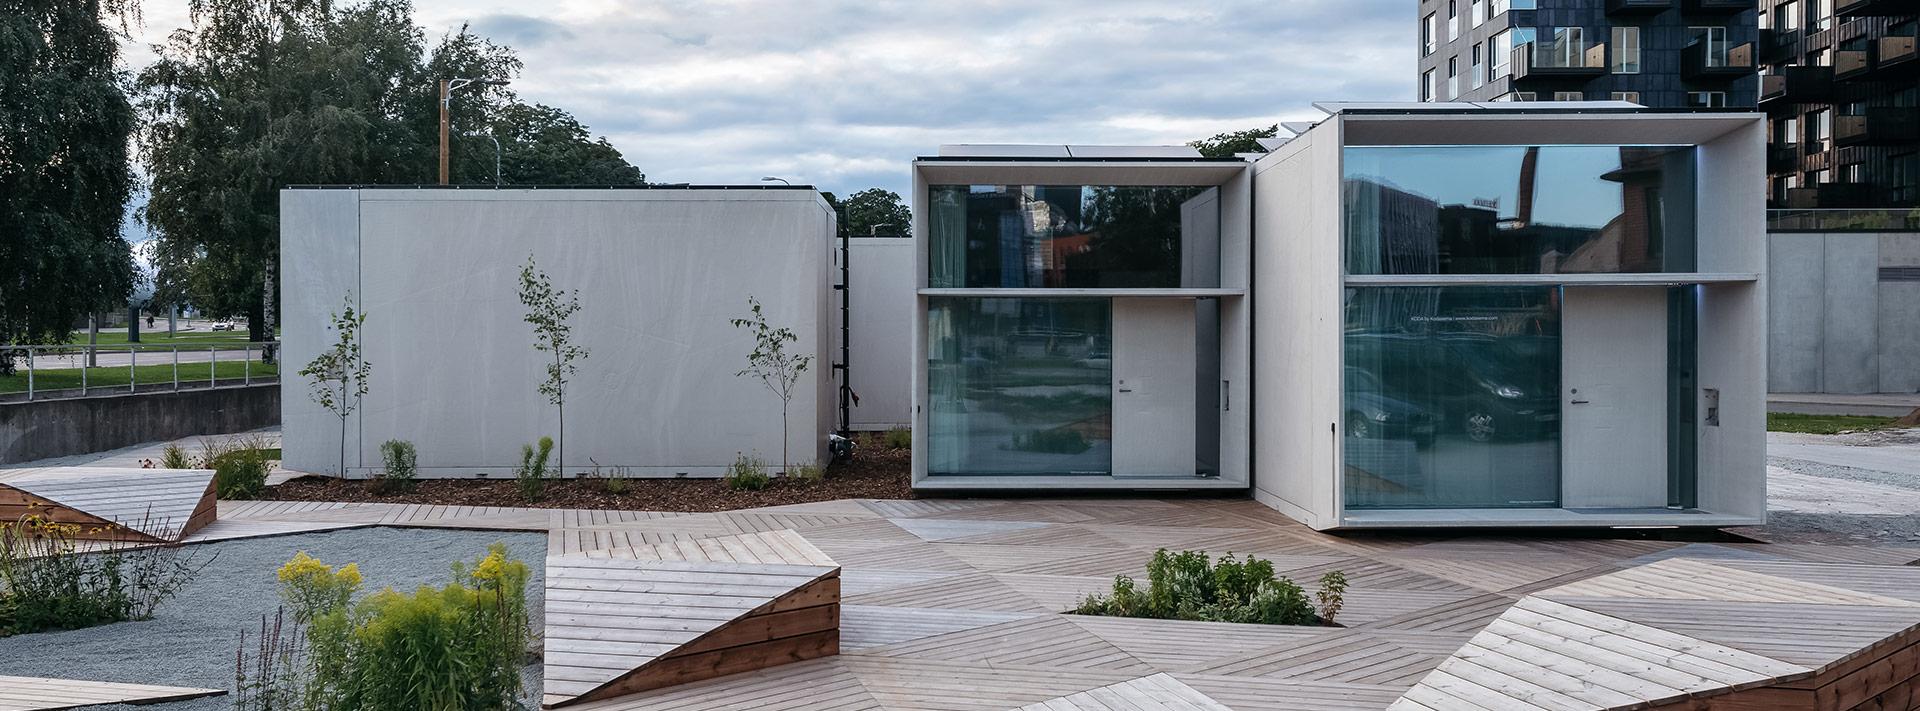 HOME - KODA by KODASEMA Minimalist Cube House Design Philippines Html on